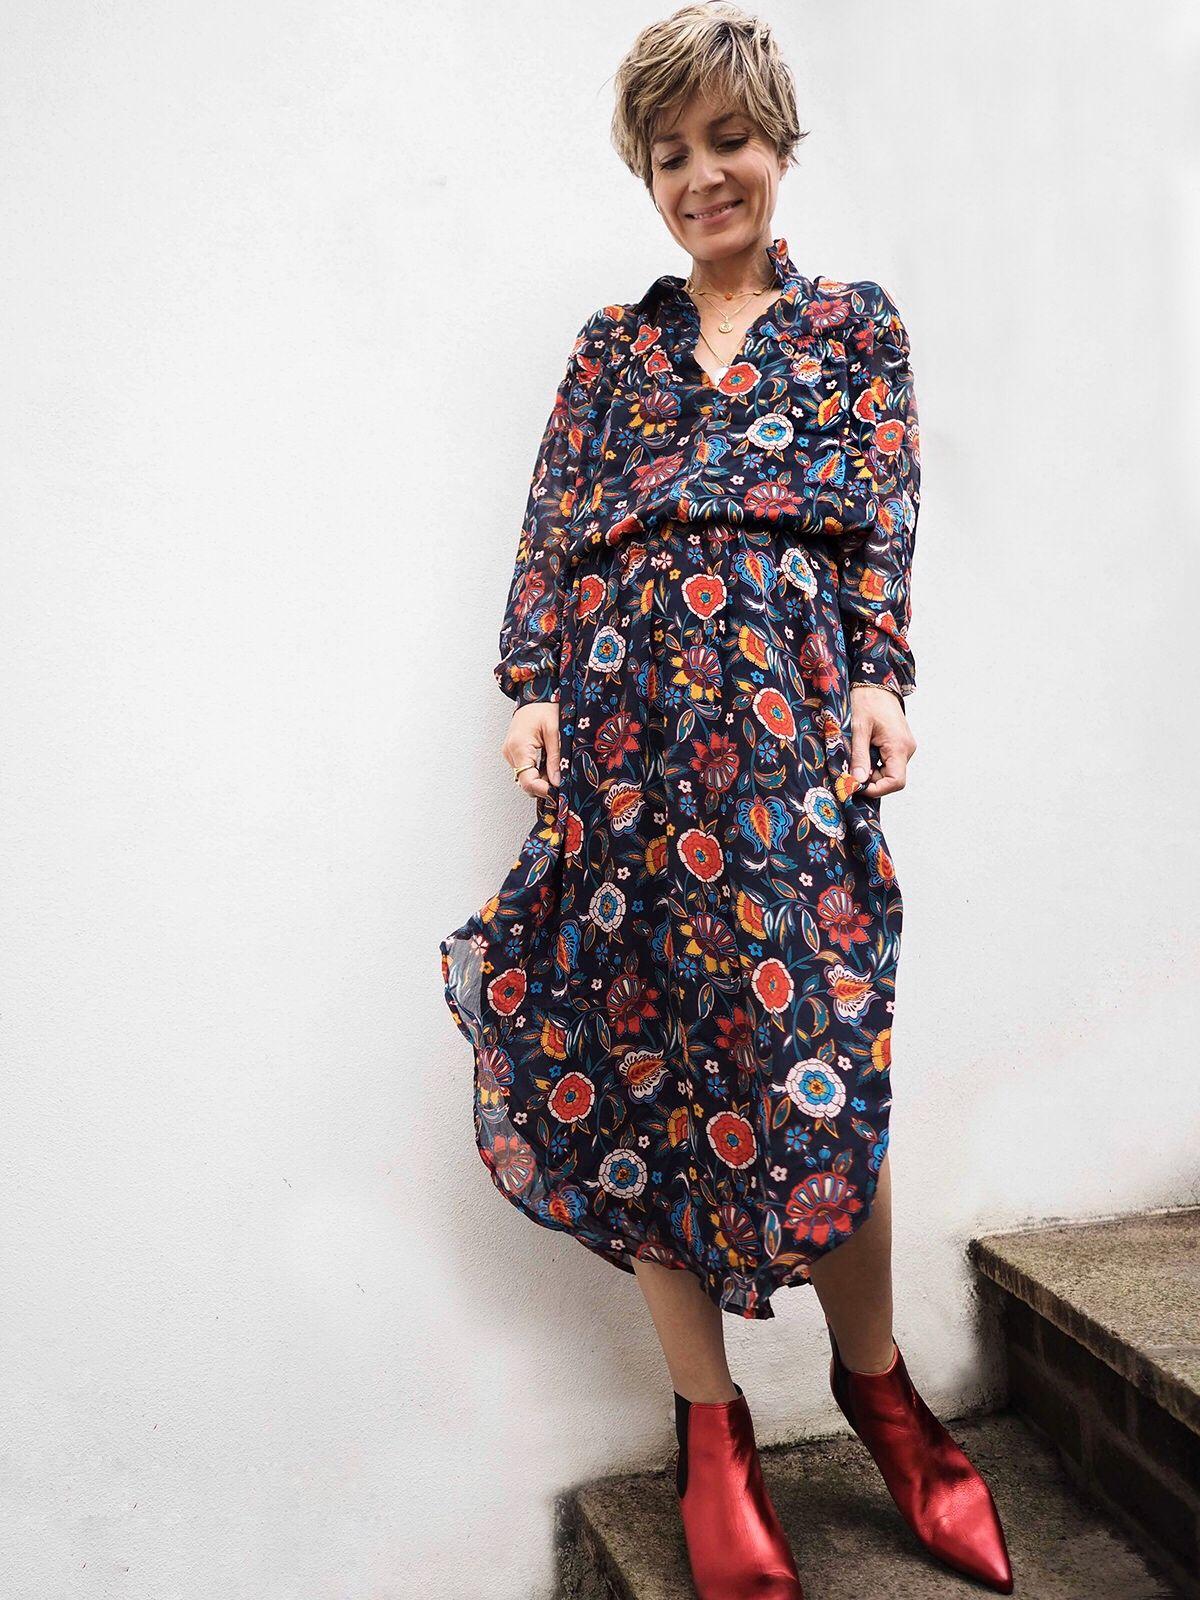 c62cfe2344ab Stylonylon Edit | Hush Homewear AW18 | Floral dress & red metallic boots |  Kitten heels